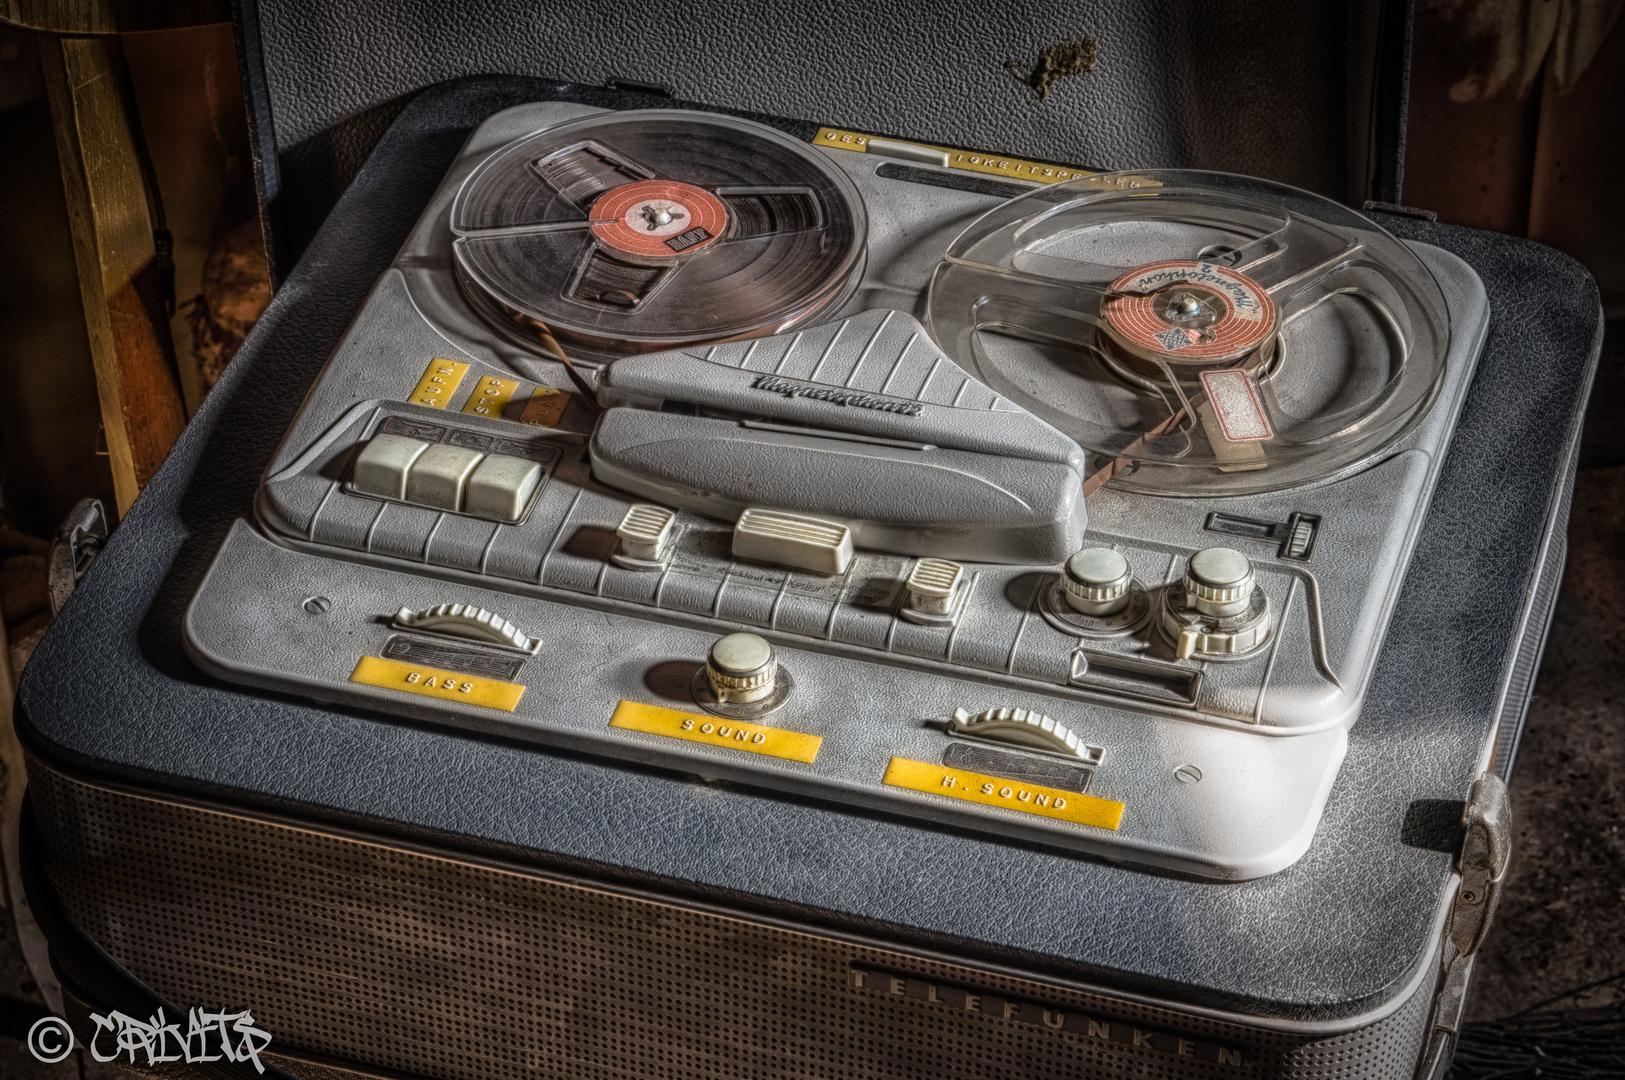 Magnetophon 85